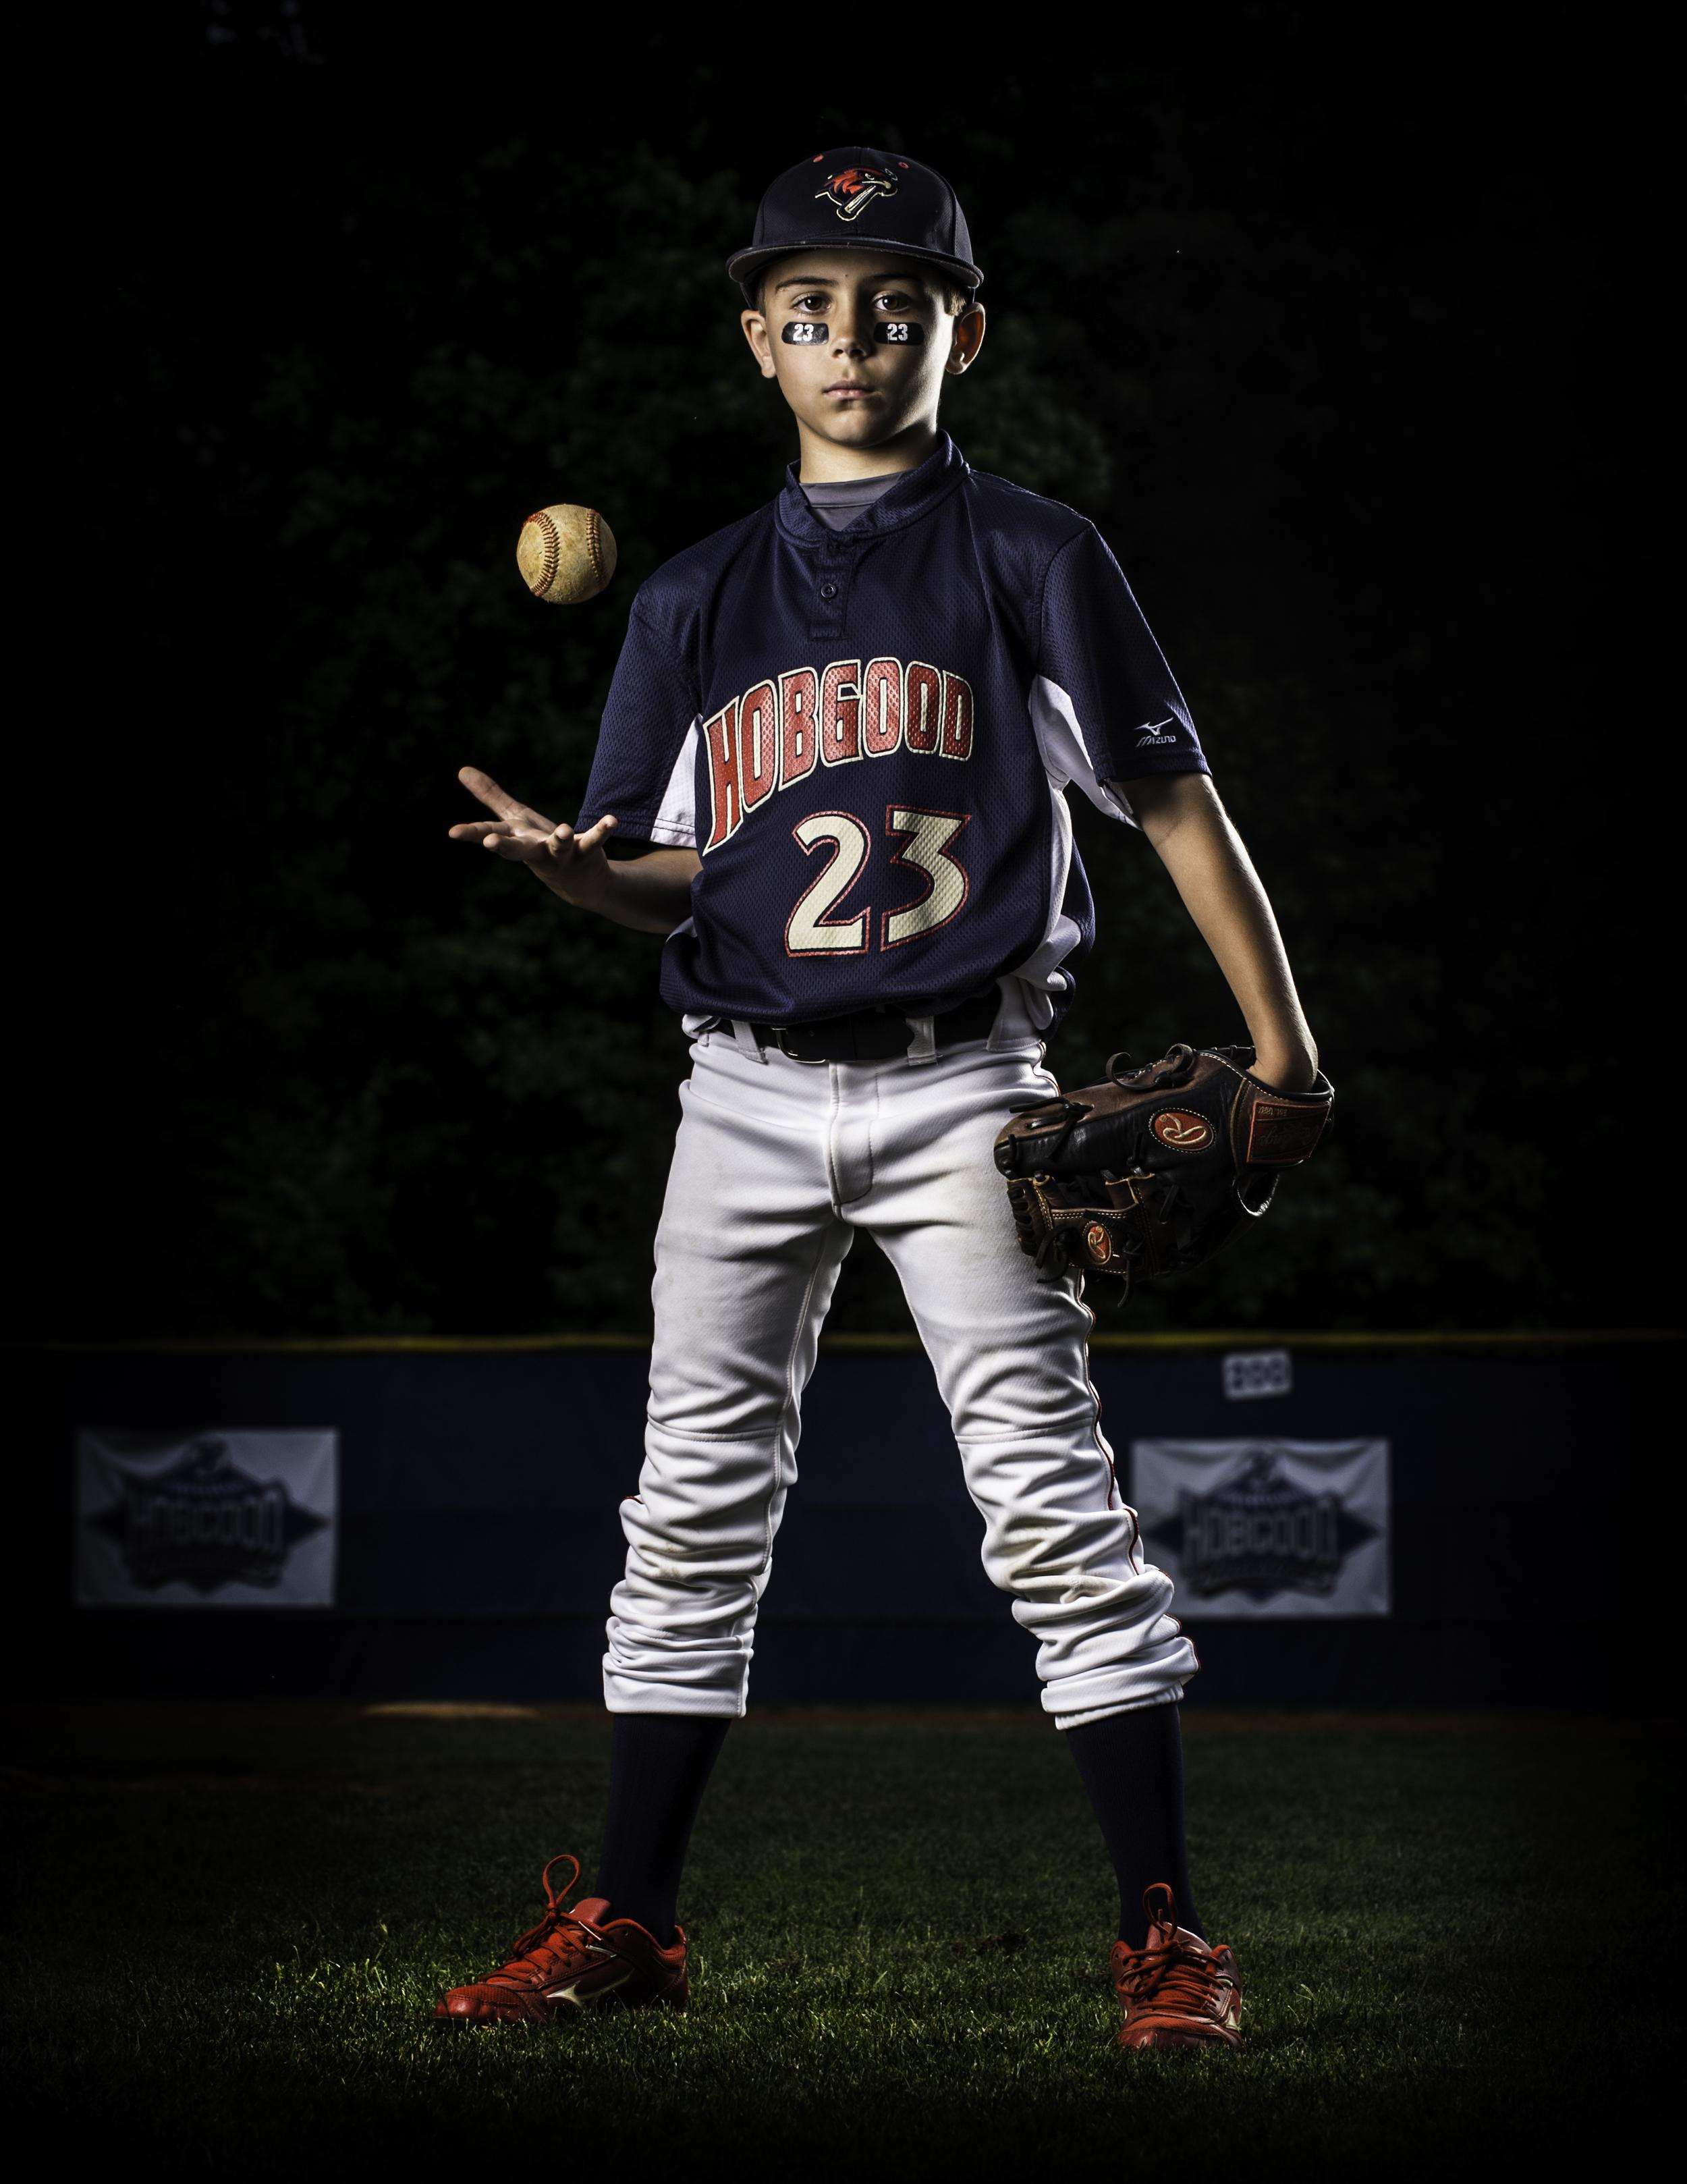 Hobgood Travel Baseball